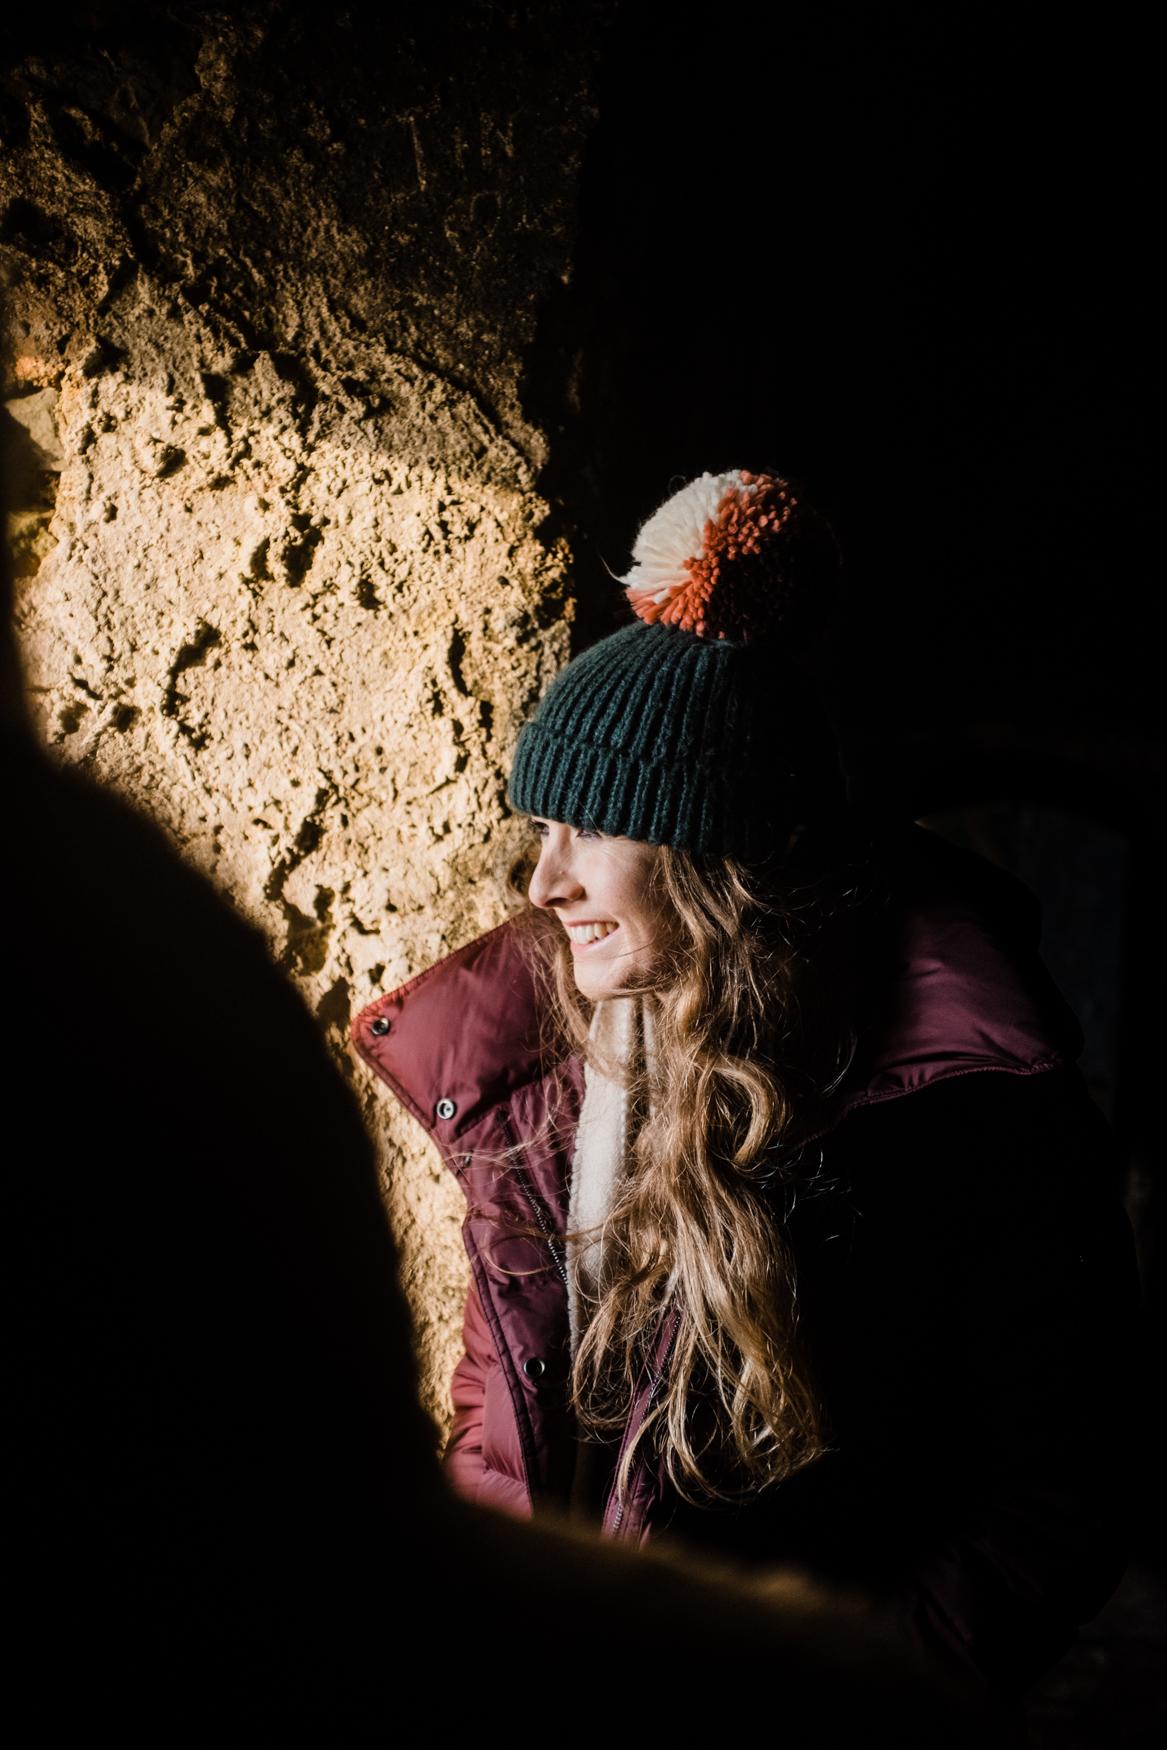 Alex-Sedgmond-Photography-Cardiff-Prewedding-Photography-Castlemartin-Pembrokeshire-WestWales-3.JPG